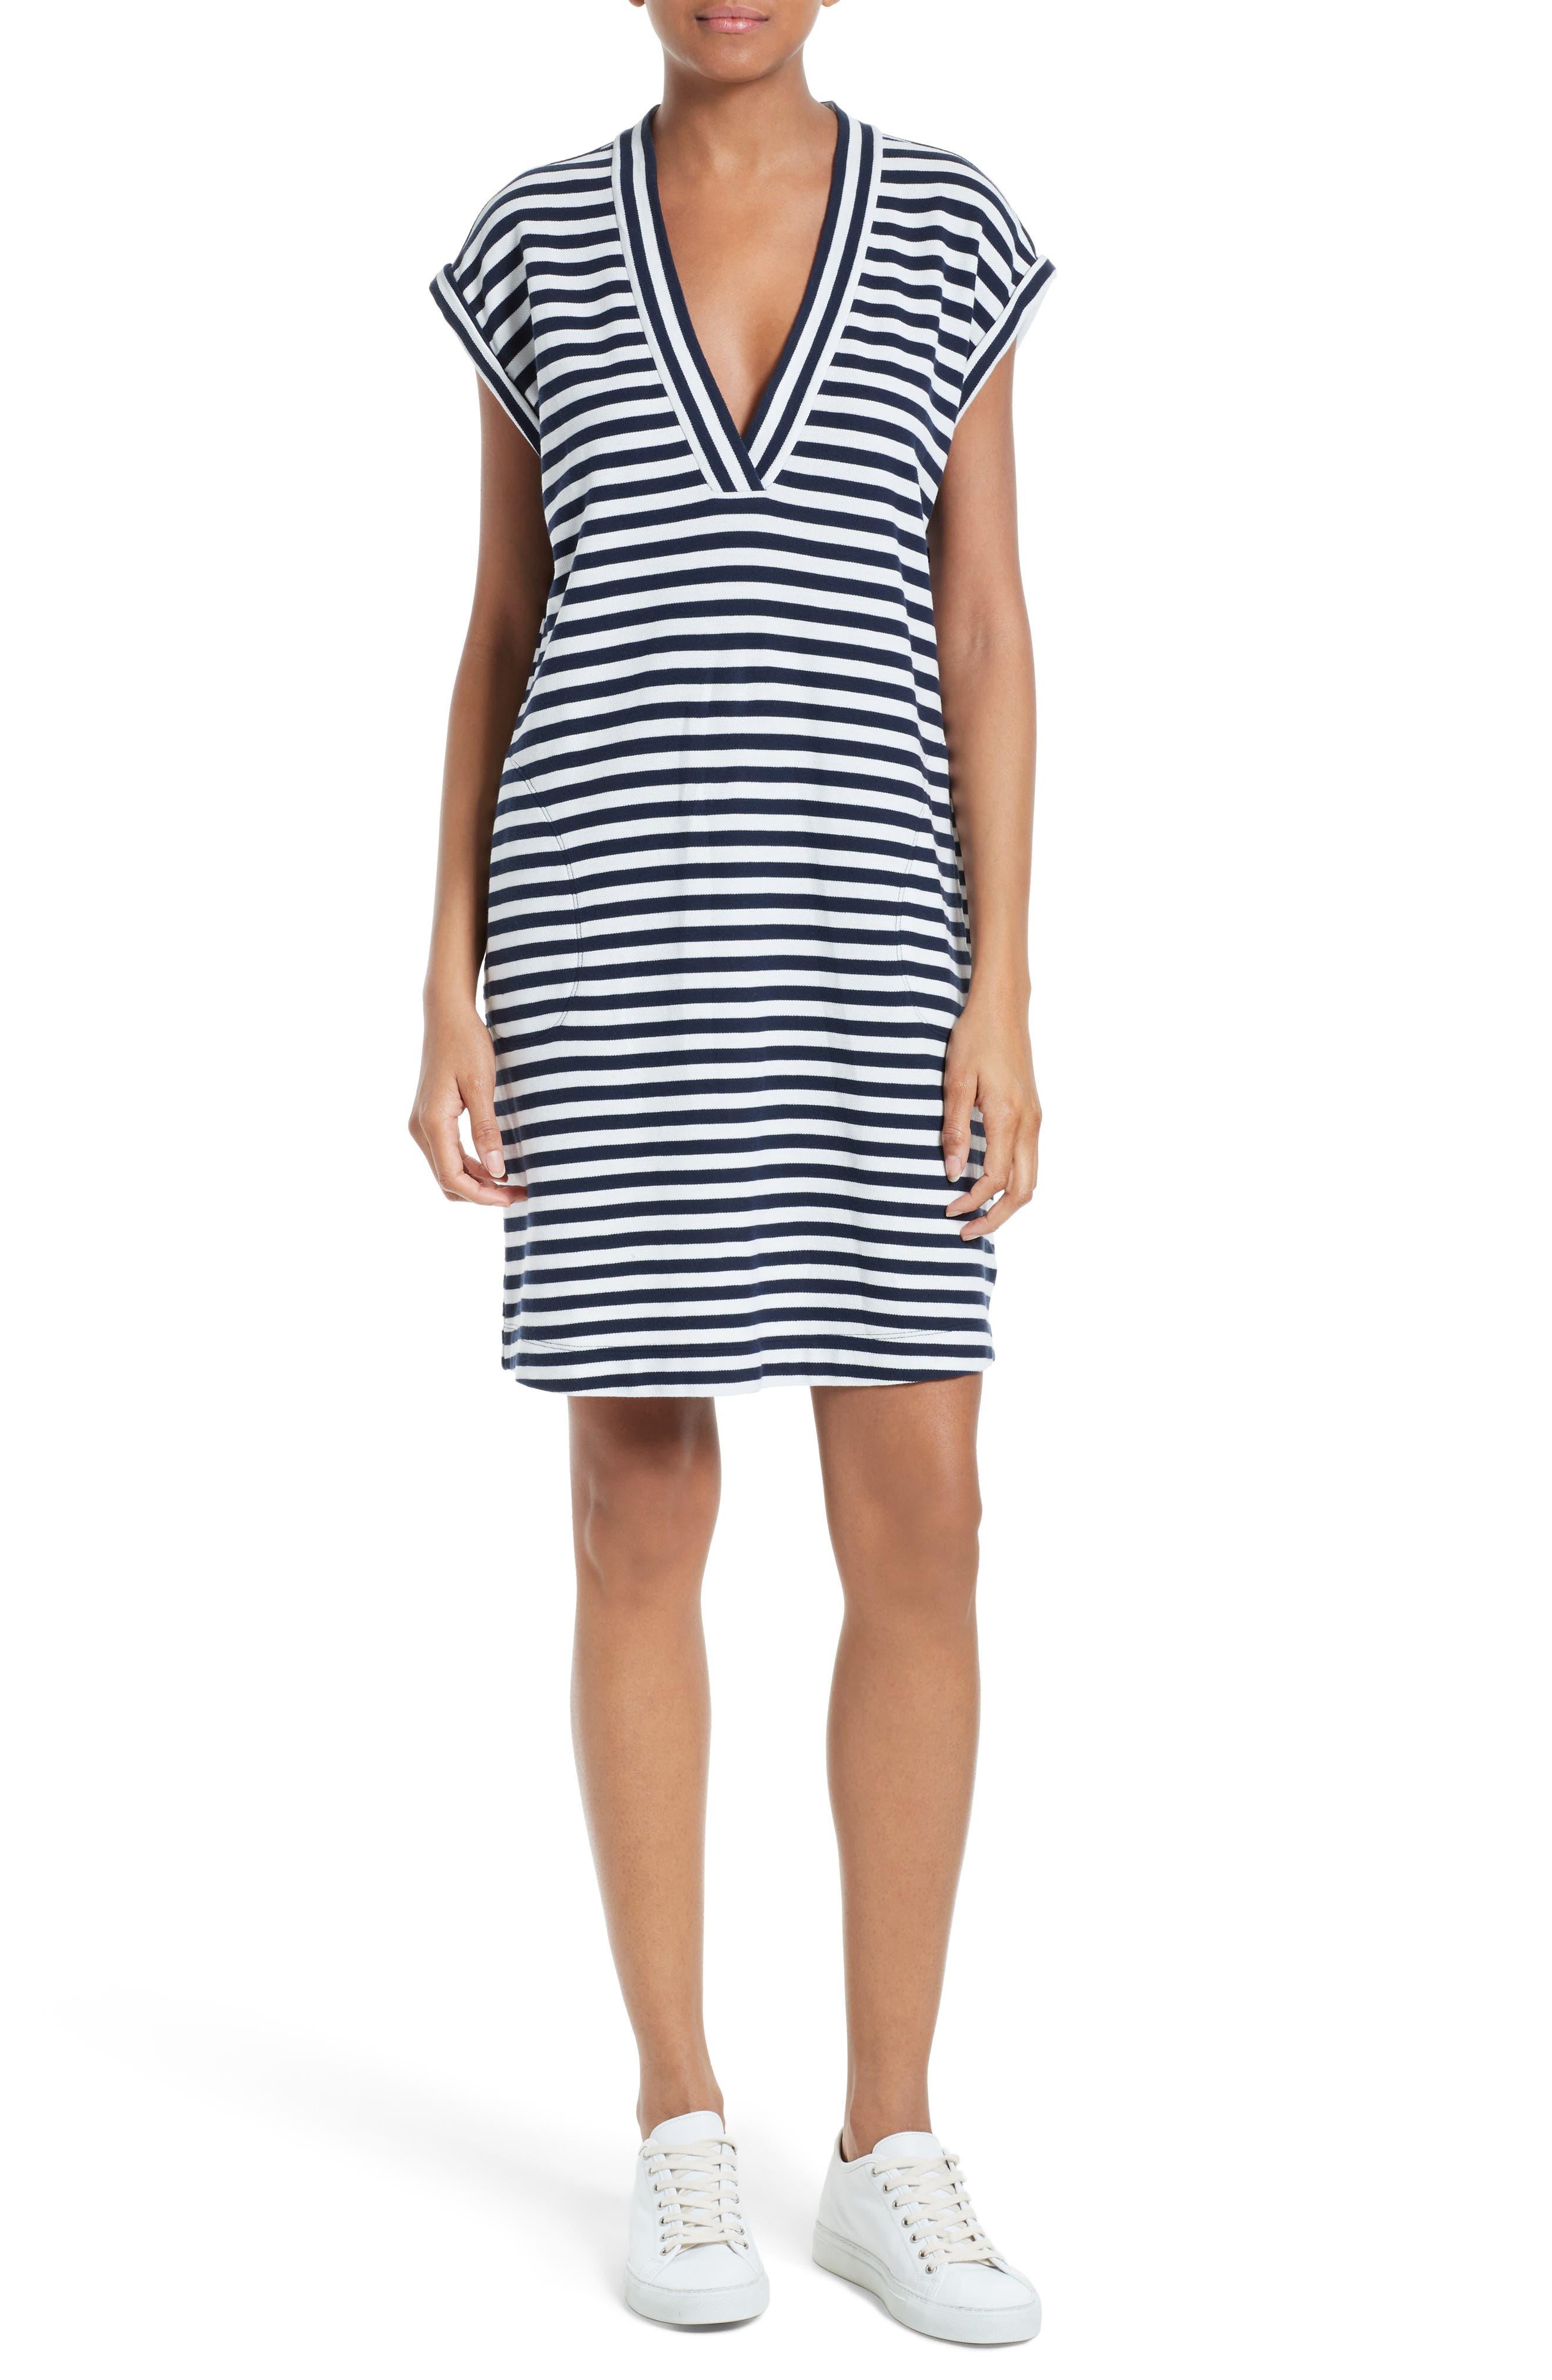 Alternate Image 1 Selected - ATM Anthony Thomas Melillo Extended Shoulder Piqué Dress